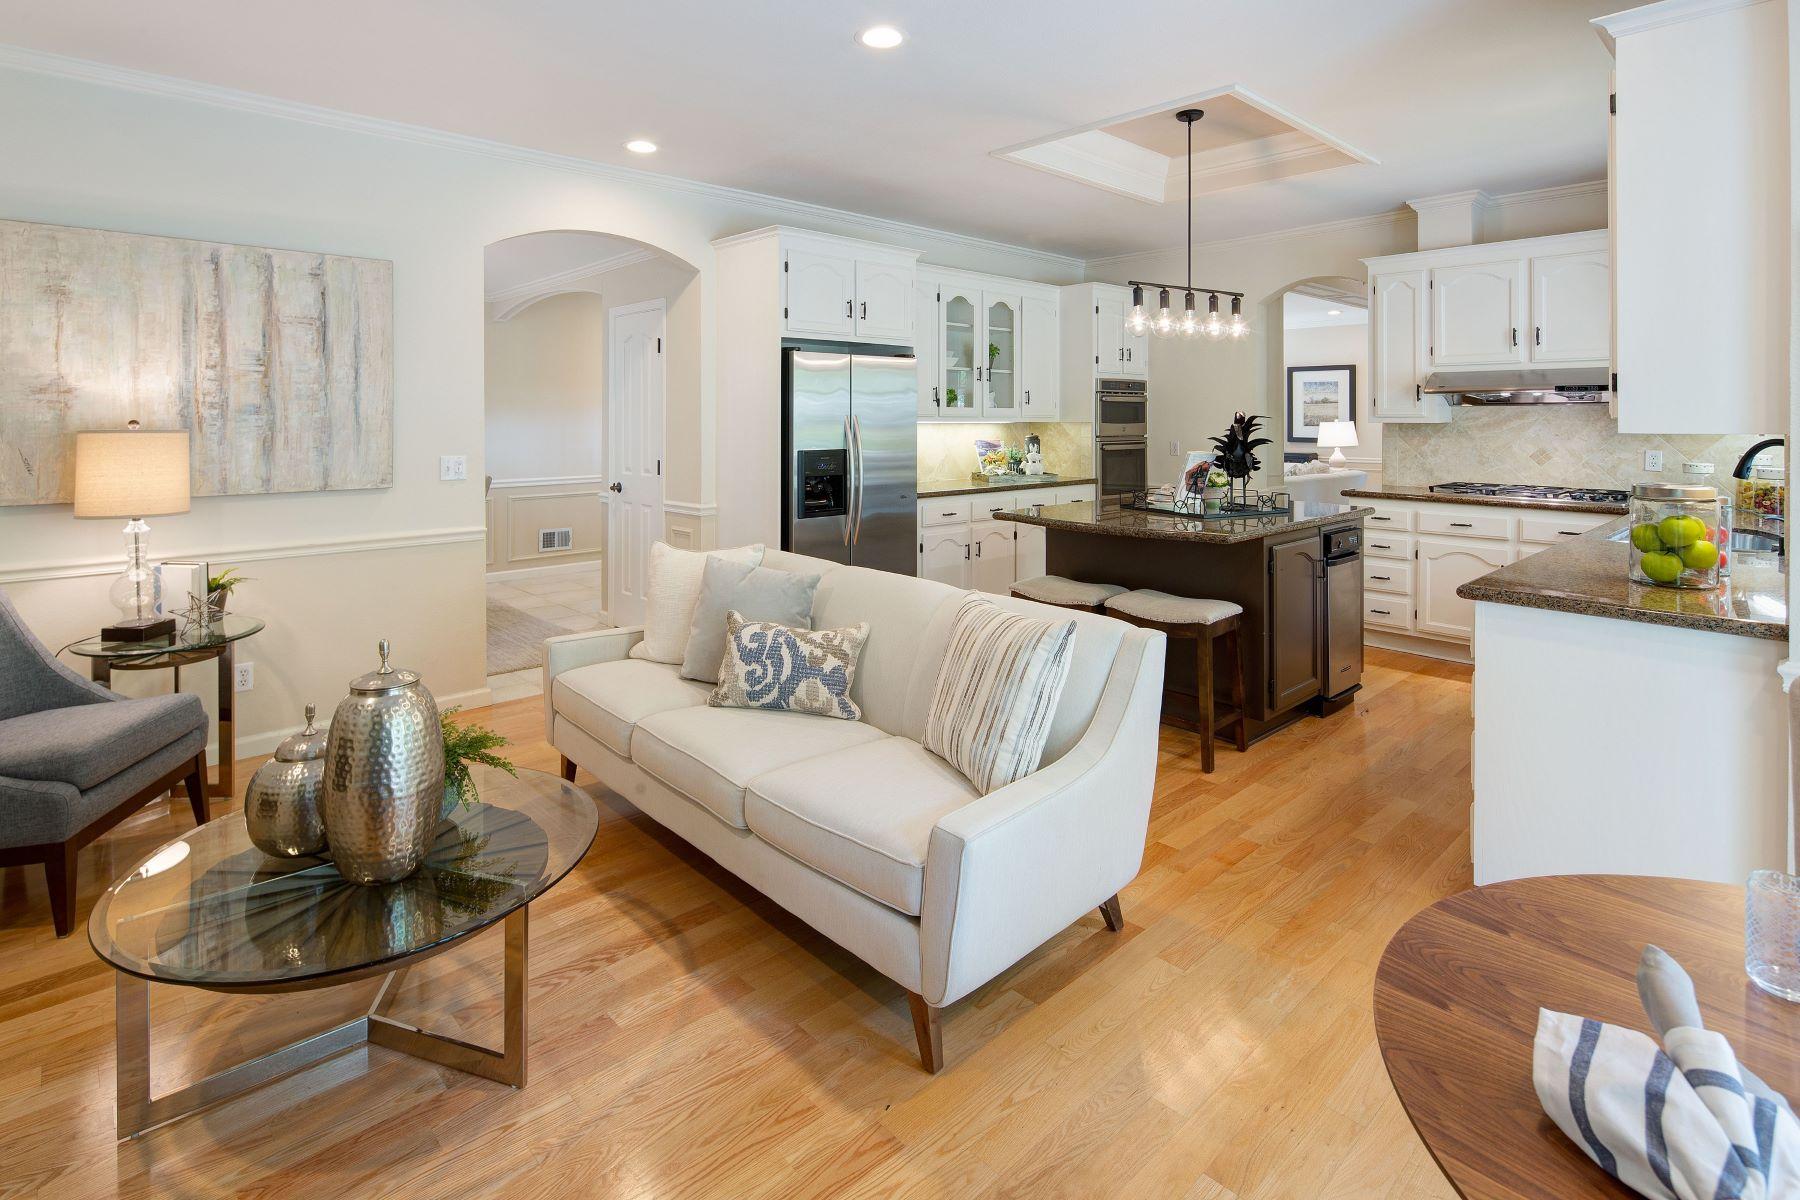 Single Family Homes for Active at Fabulous Westside Alamo Home 46 Vista Lane Alamo, California 94507 United States